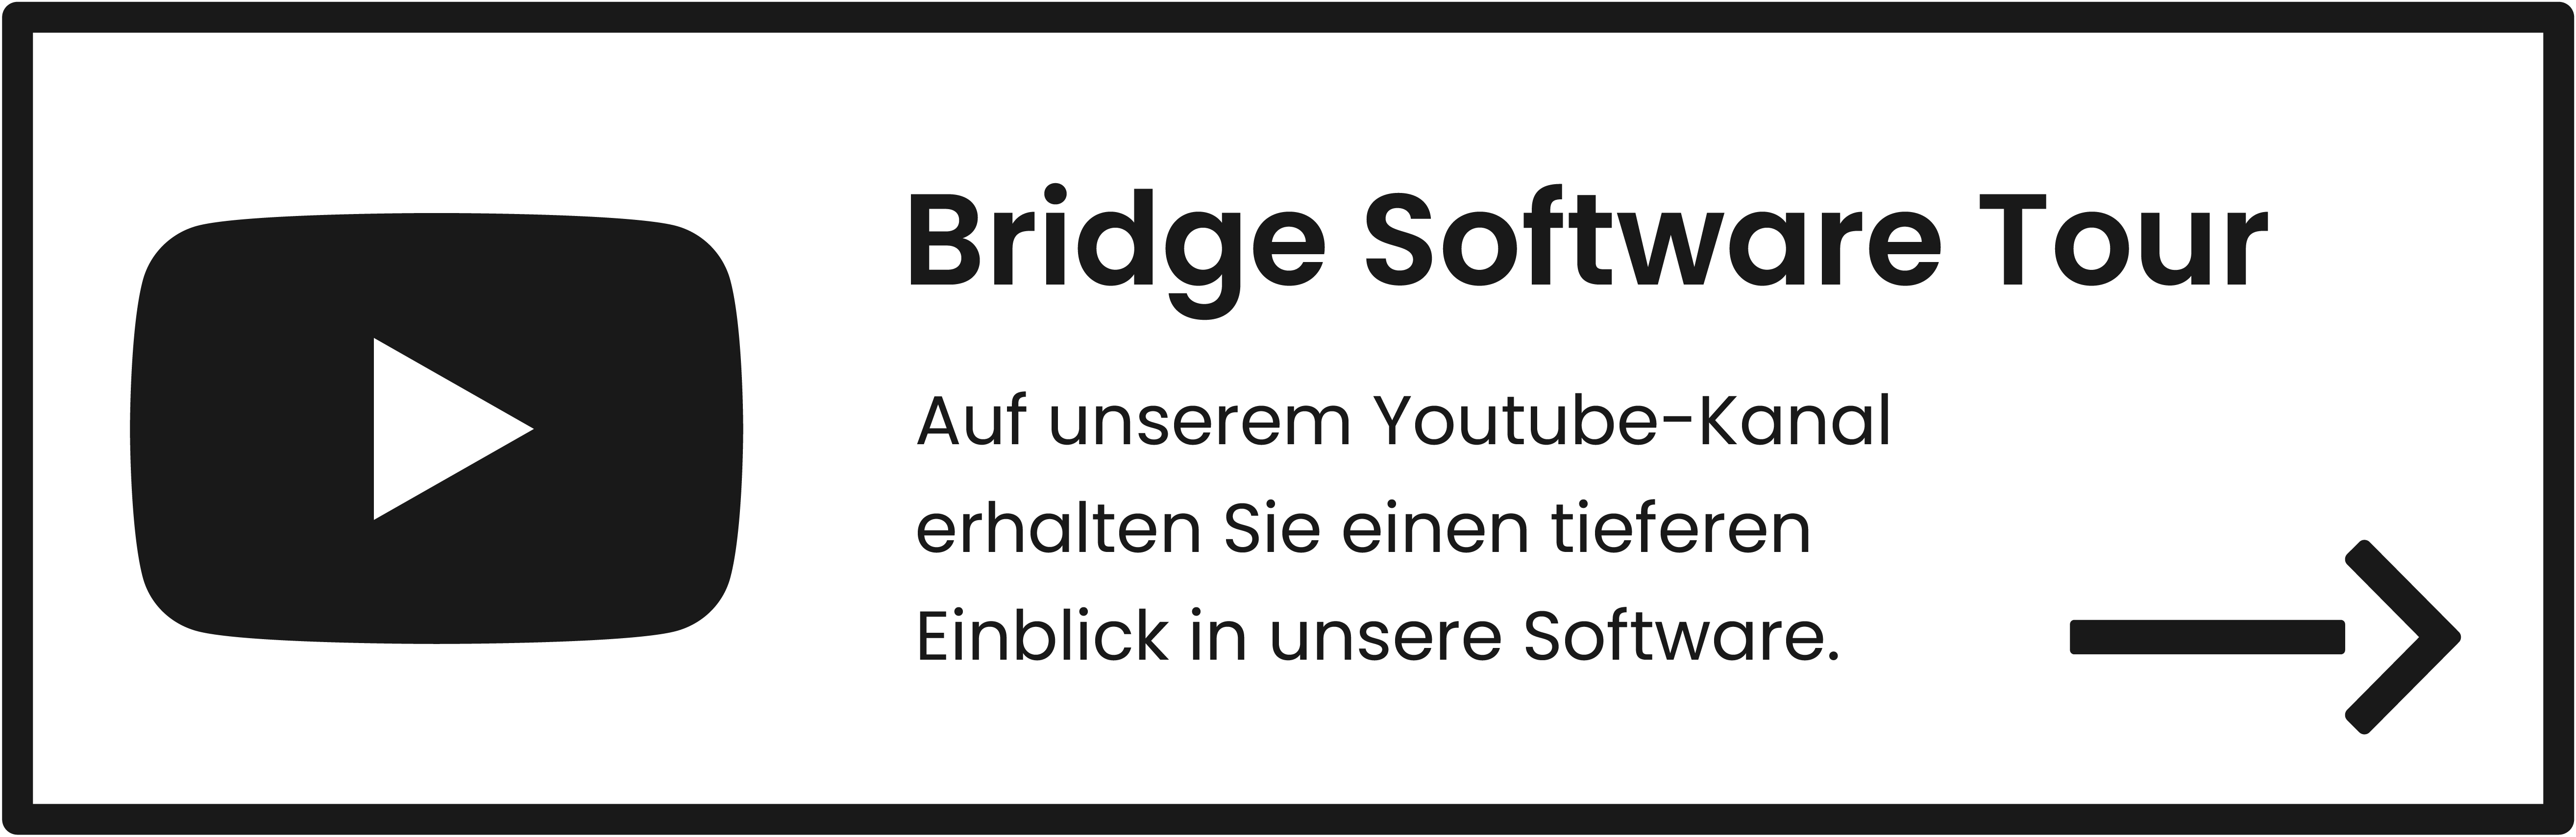 teaser-bild-youtube-software-tour-bridge-videoberatung-software